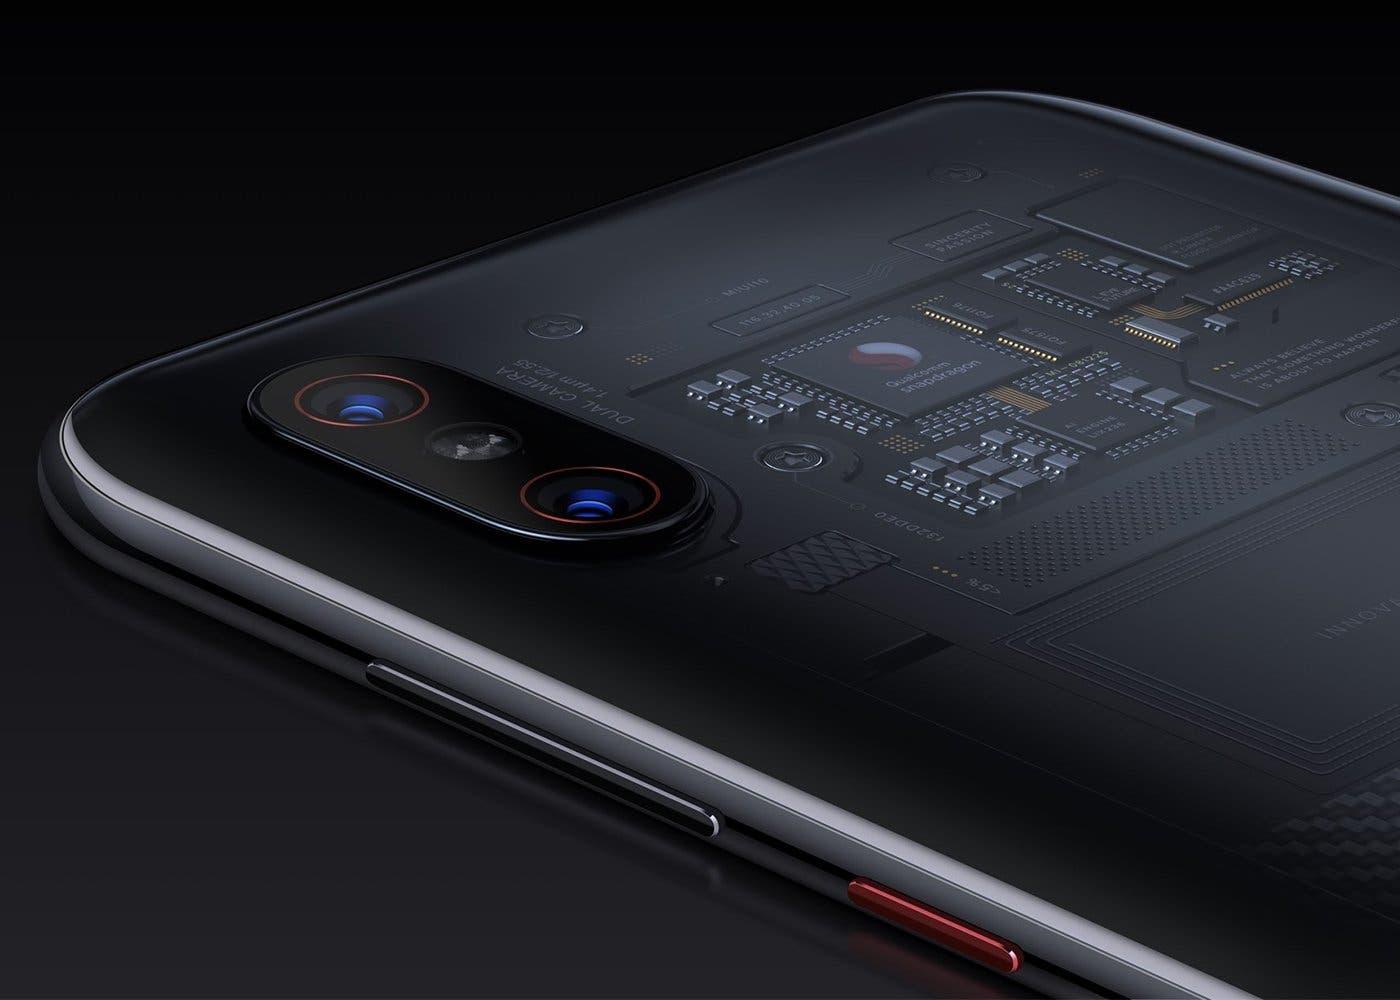 El Xiaomi Mi 8 va a recibir muy pronto el modo noche del Mi Mix 3